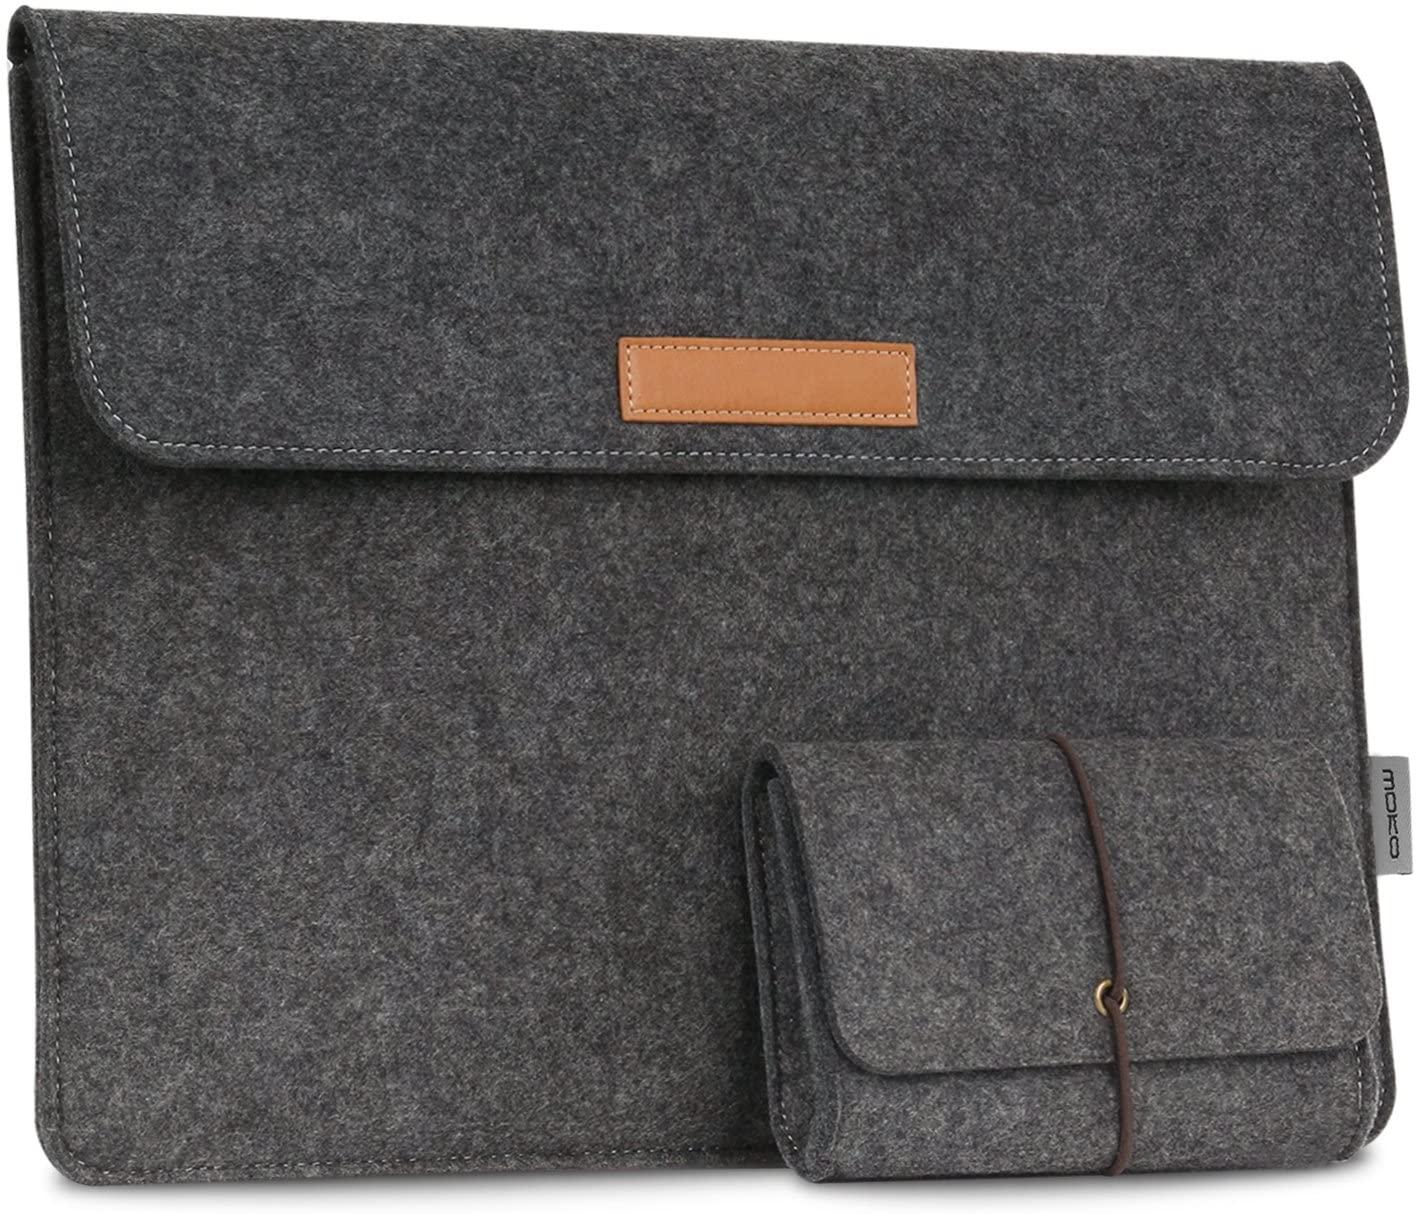 MoKo 13-13.3 Inch Laptop Sleeve Case Fits MacBook Air 13-inch Retina, MacBook Pro 13